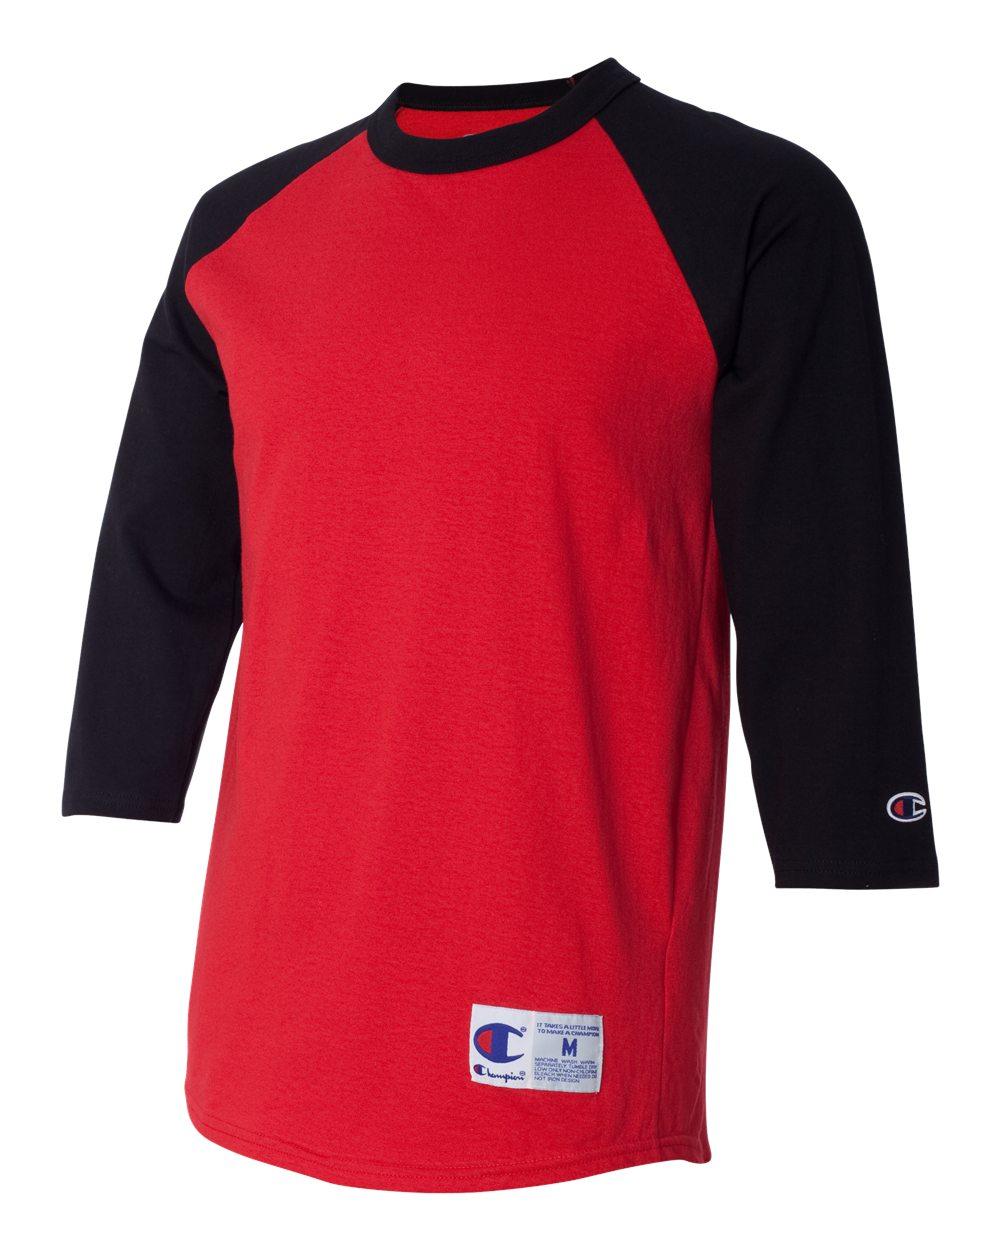 Champion - T1397 Baseball Jersey Short Sleeve Tagless Raglan T-Shirt -  Walmart.com 3910c0973